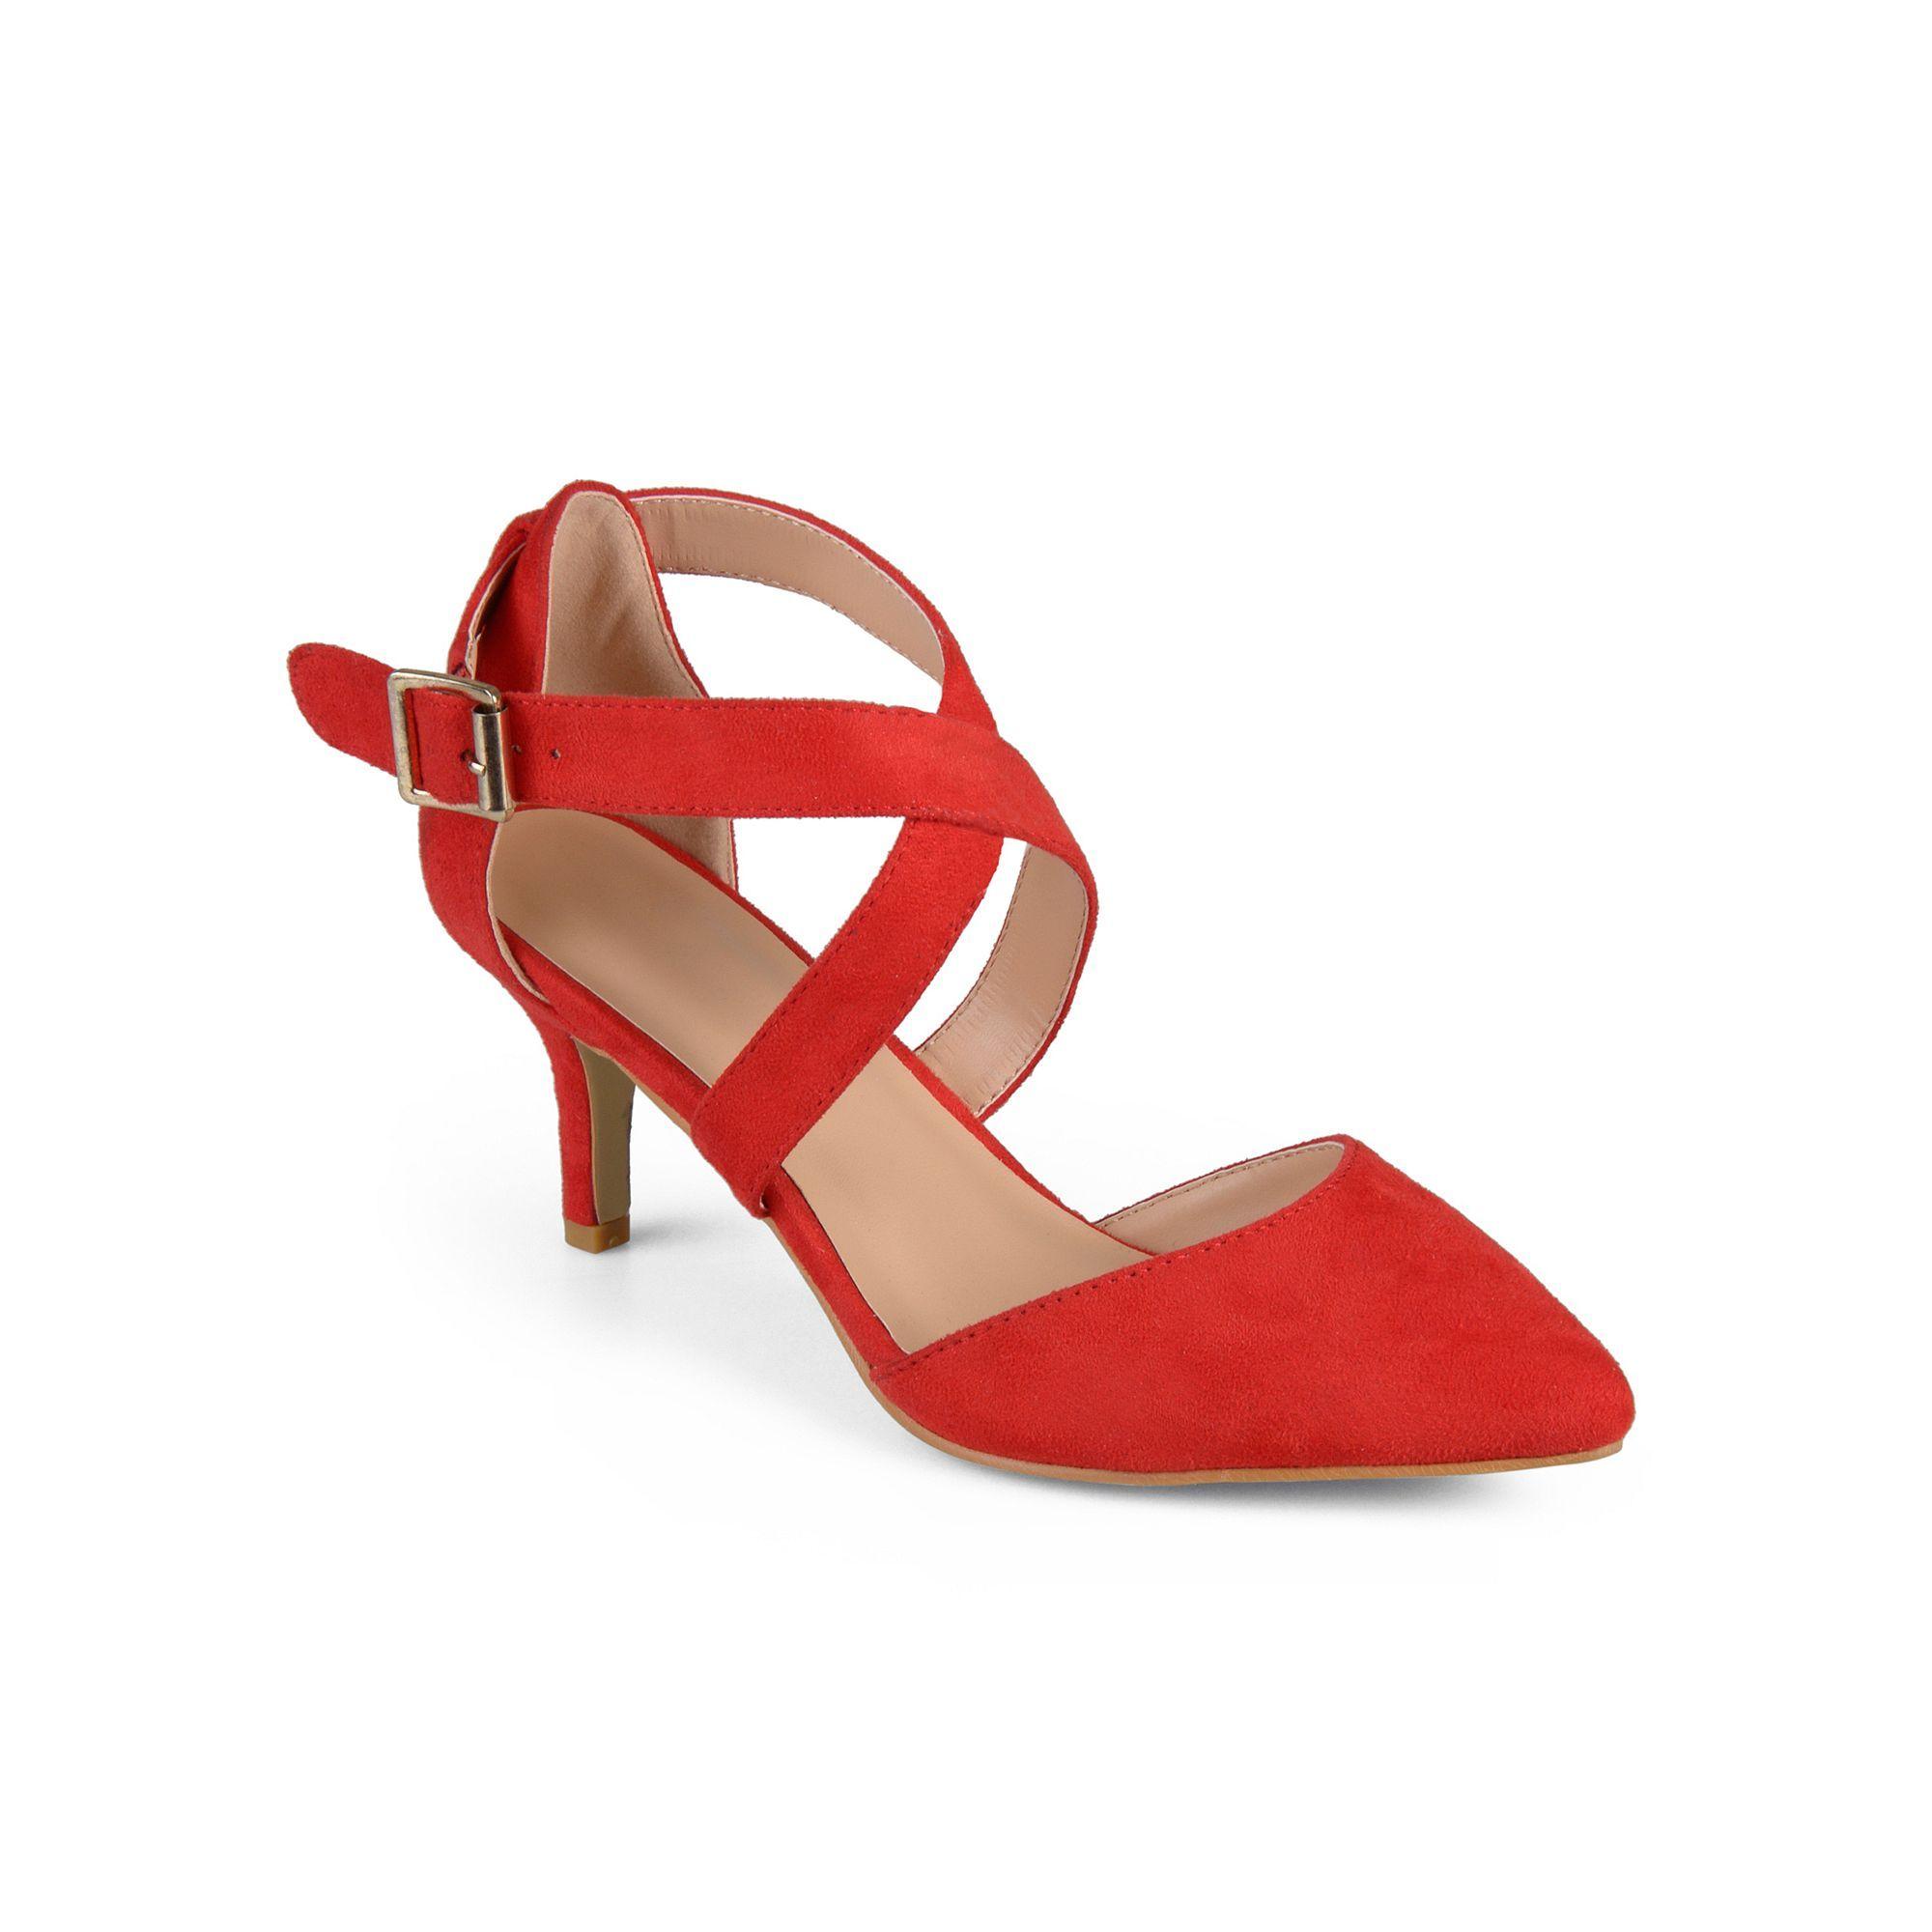 Journee Collection Dara ... Women's High Heels JWaJtn0M